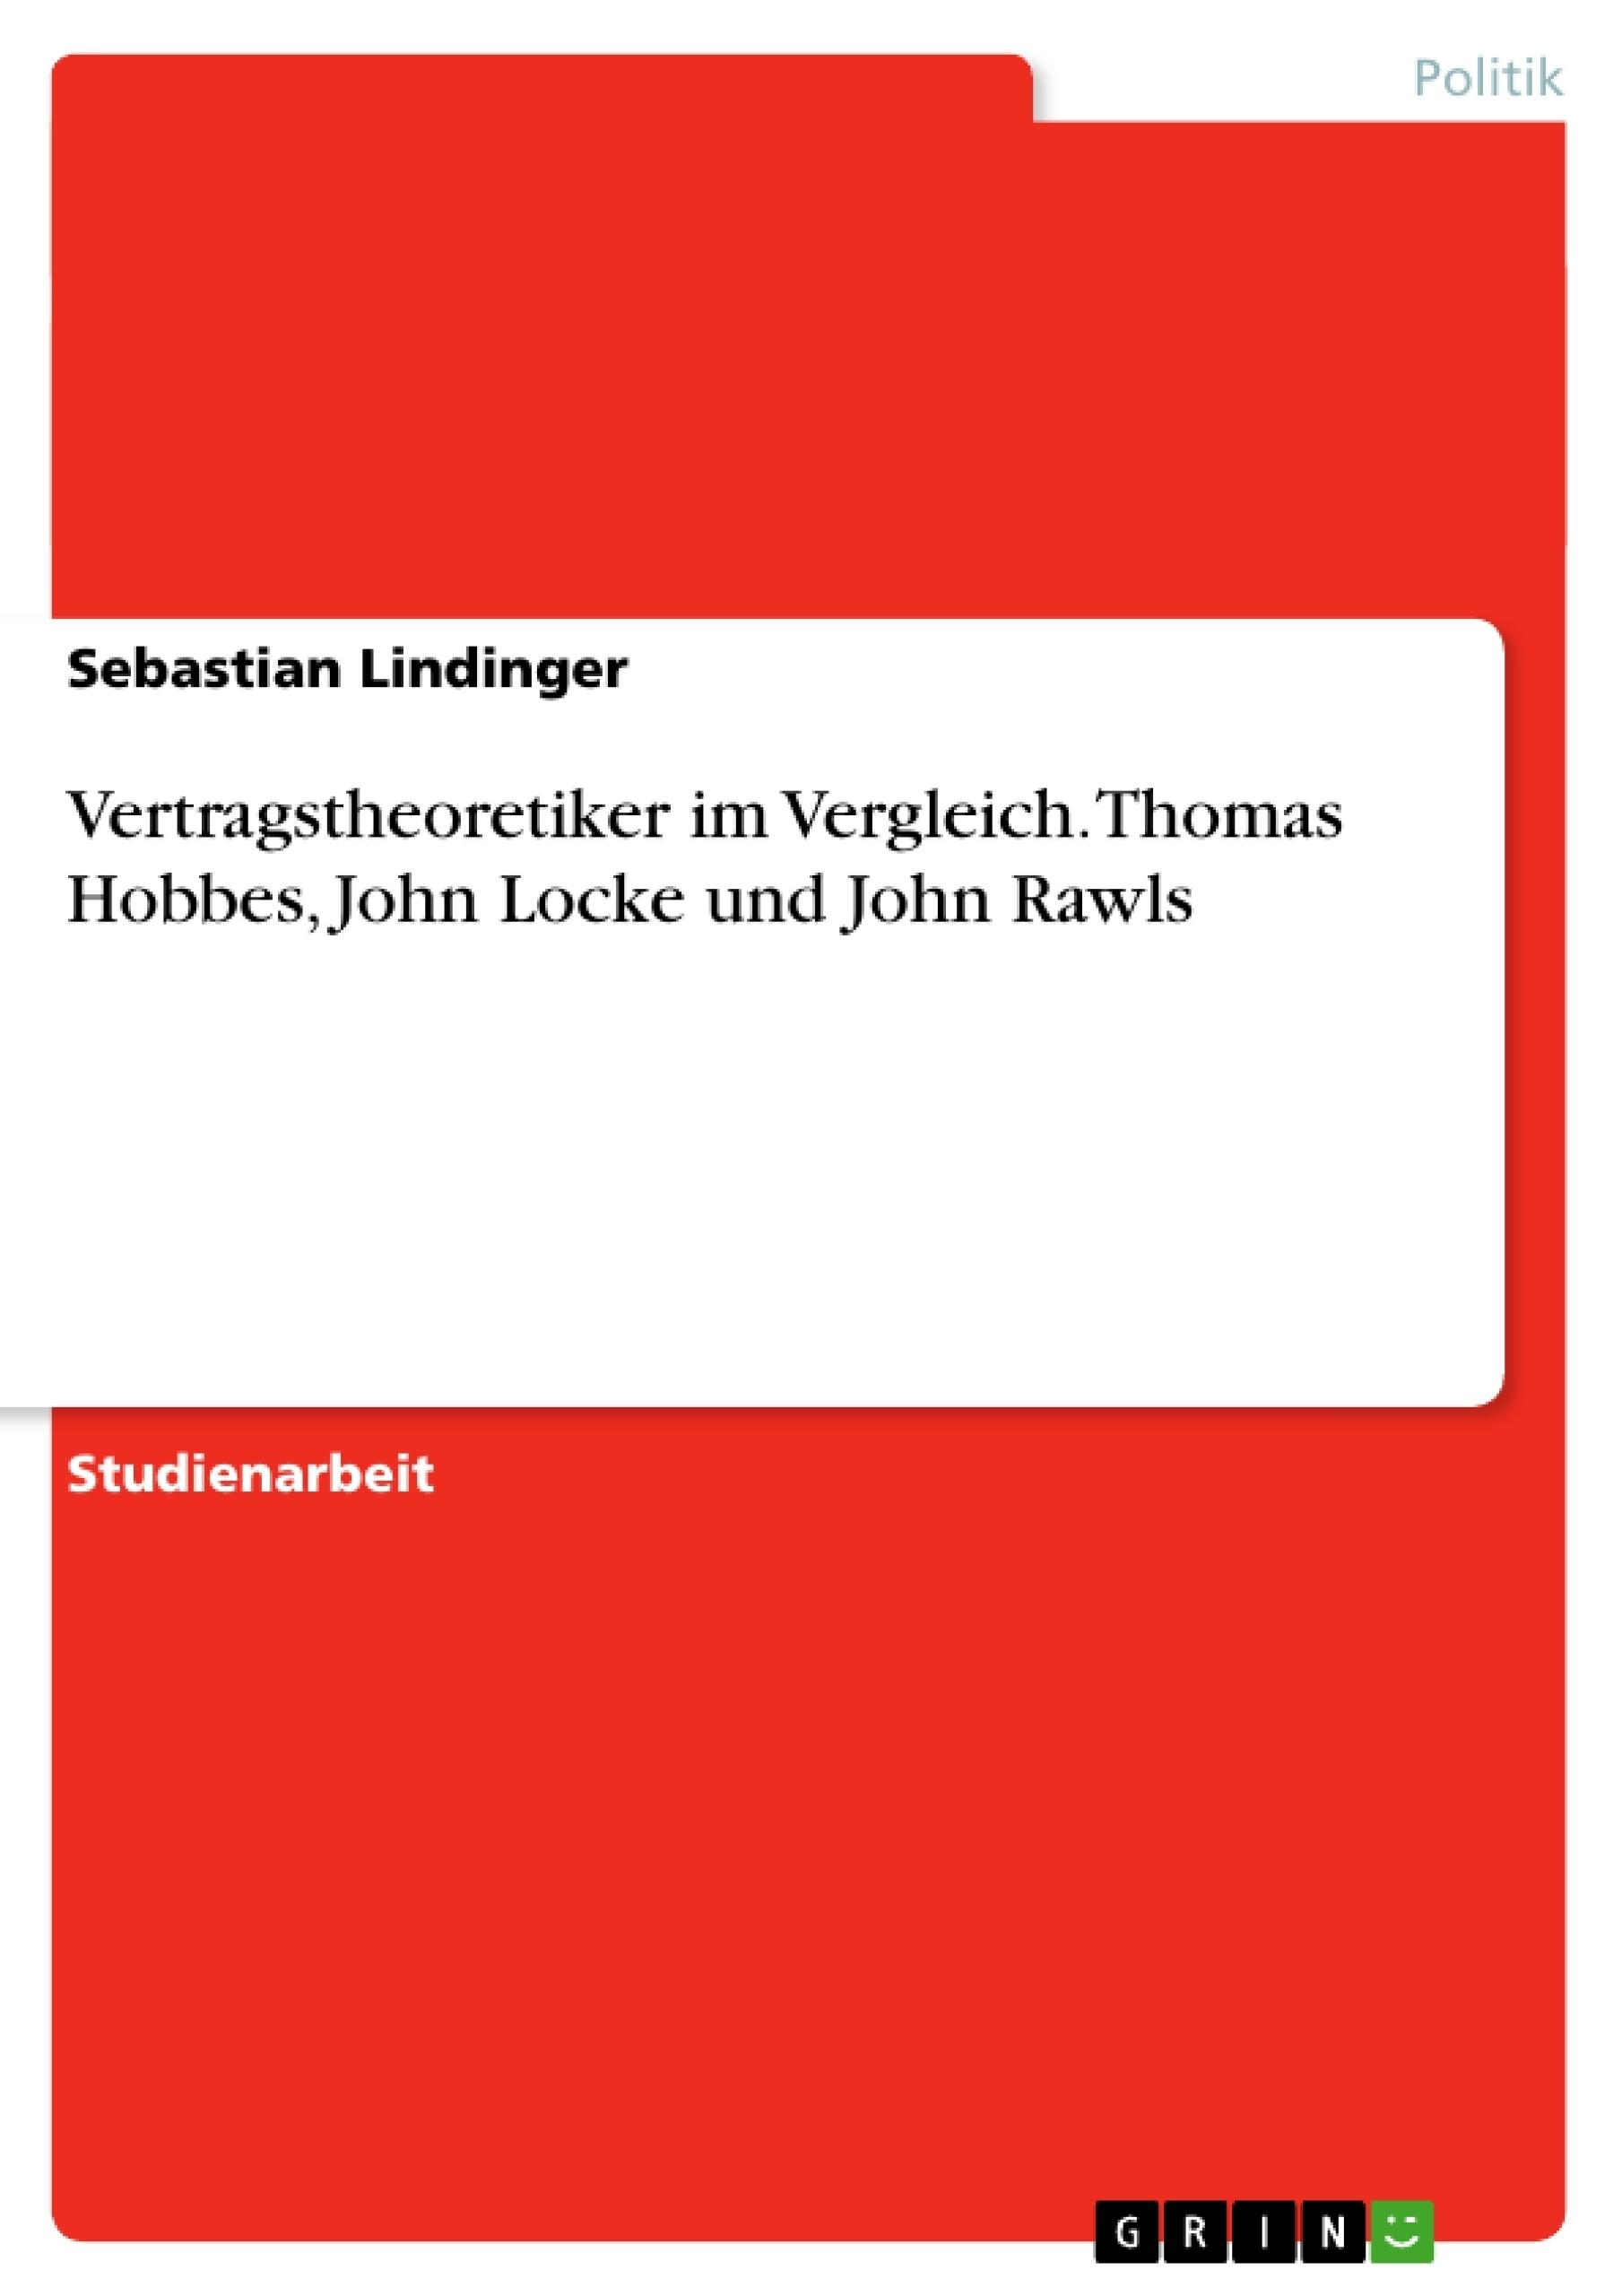 Titel: Vertragstheoretiker im Vergleich. Thomas Hobbes, John Locke und John Rawls